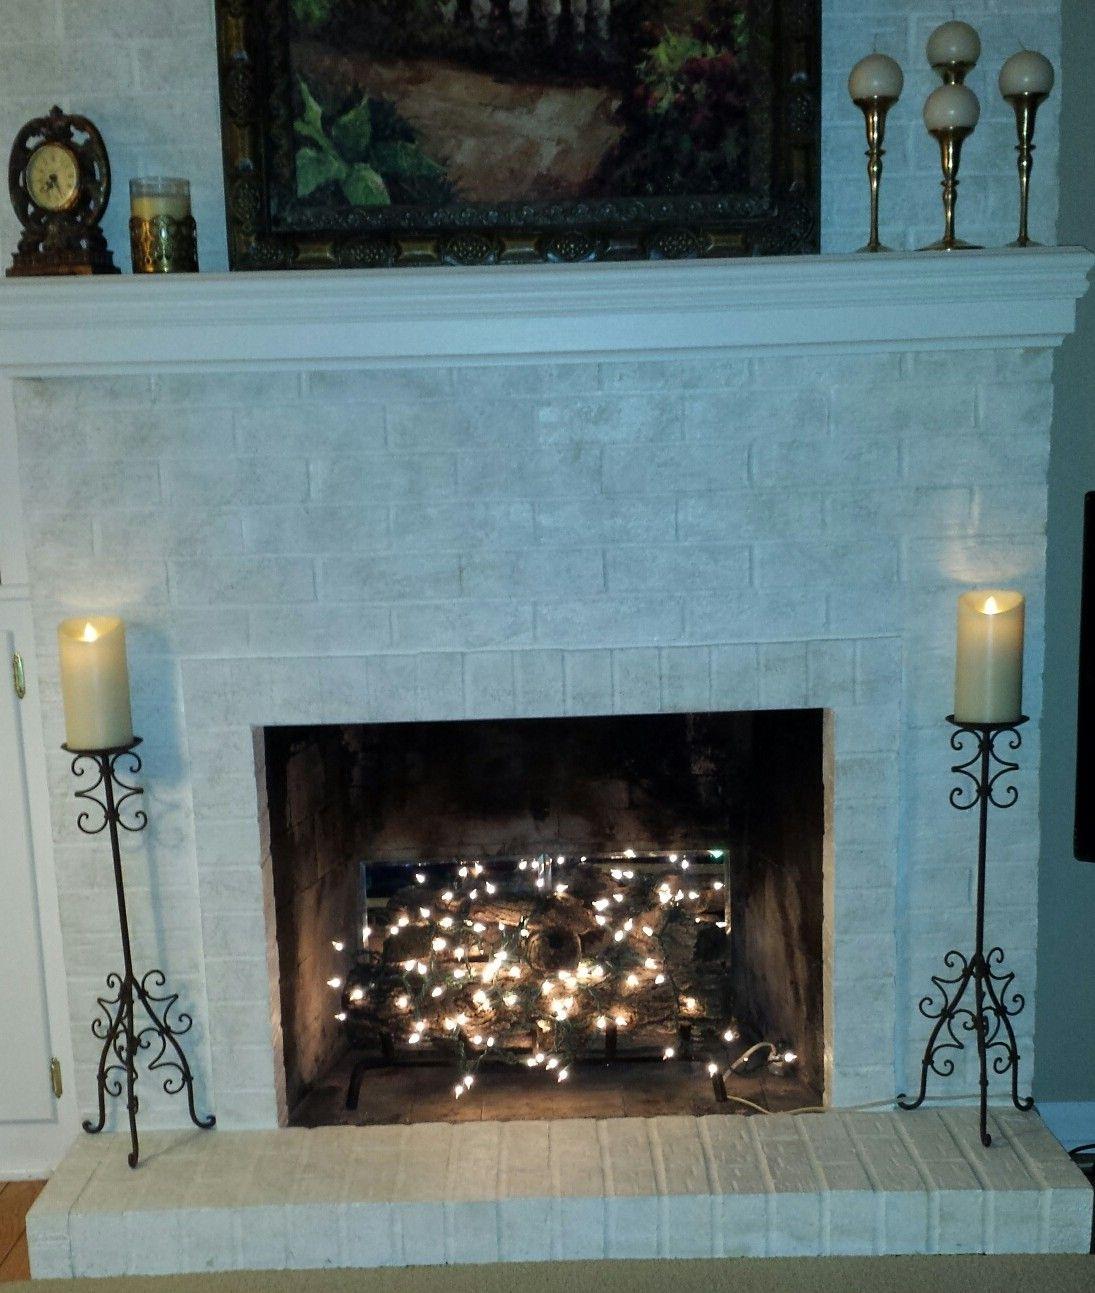 Twinkle Lights In Fireplace Fireplace Lighting Fake Fireplace